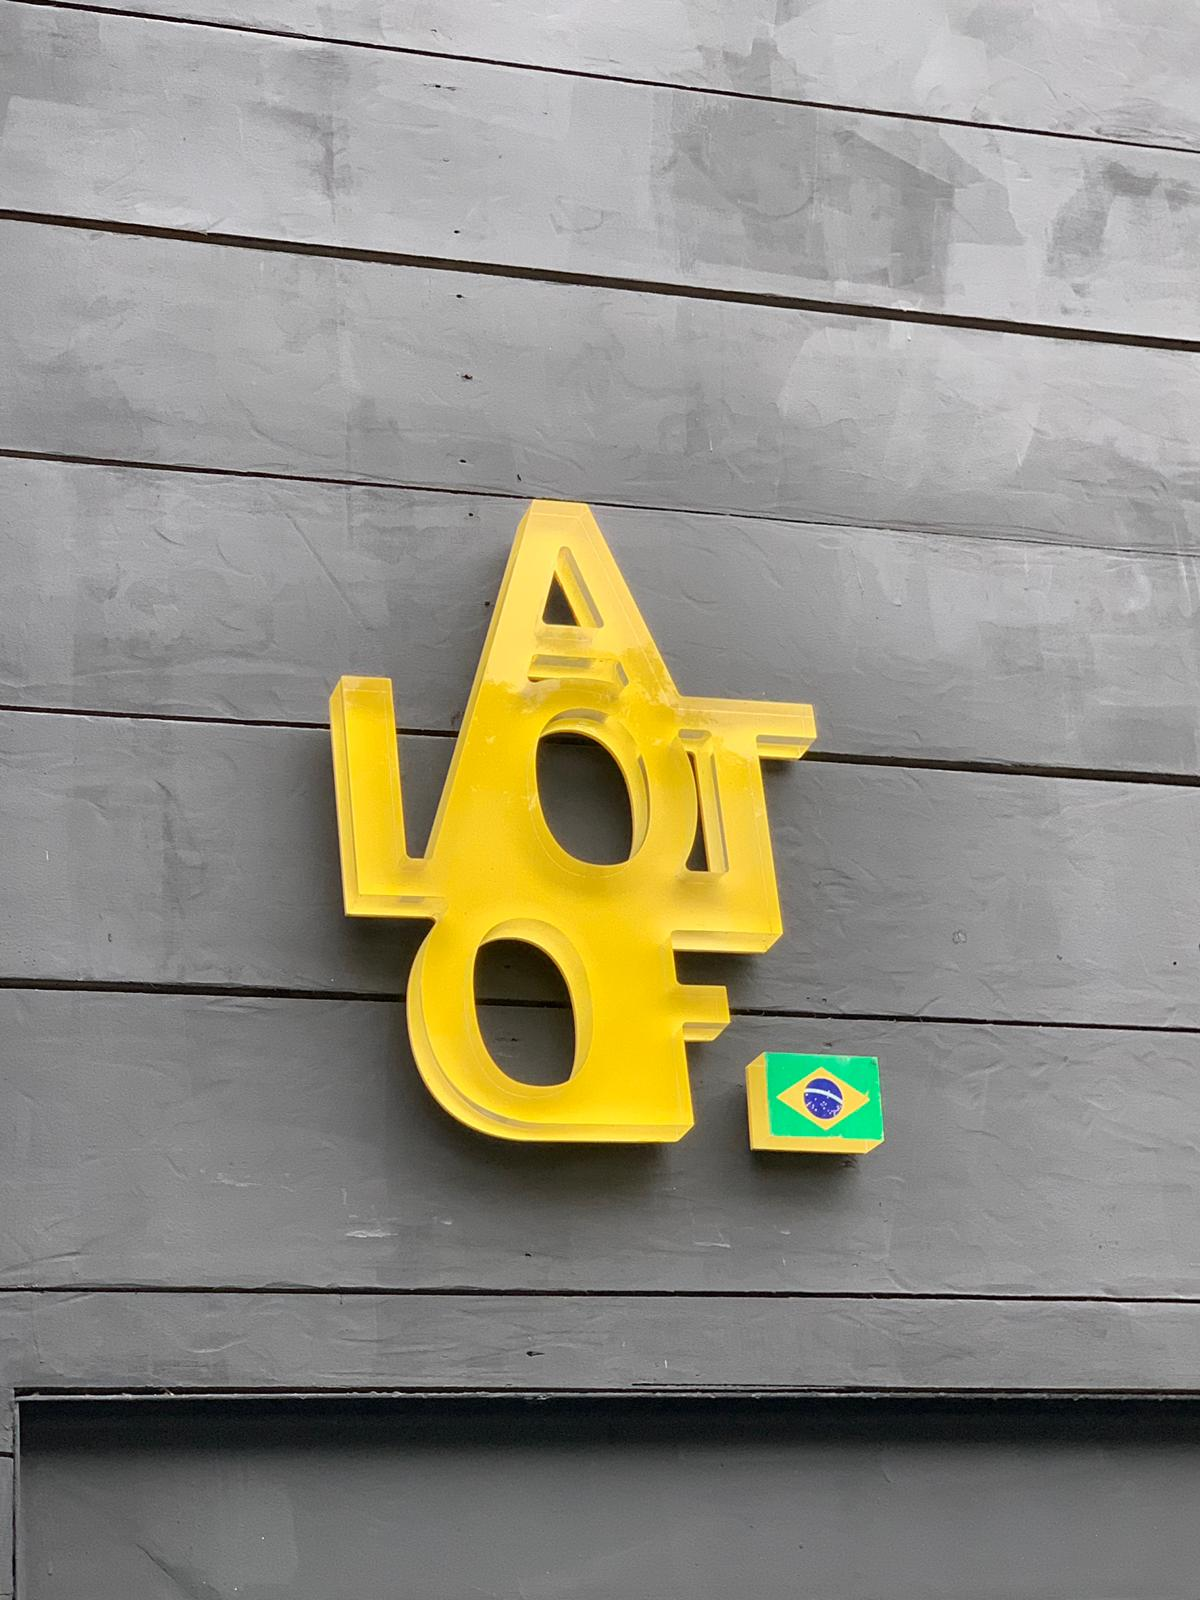 A lot of Brasil, Sao Paulo